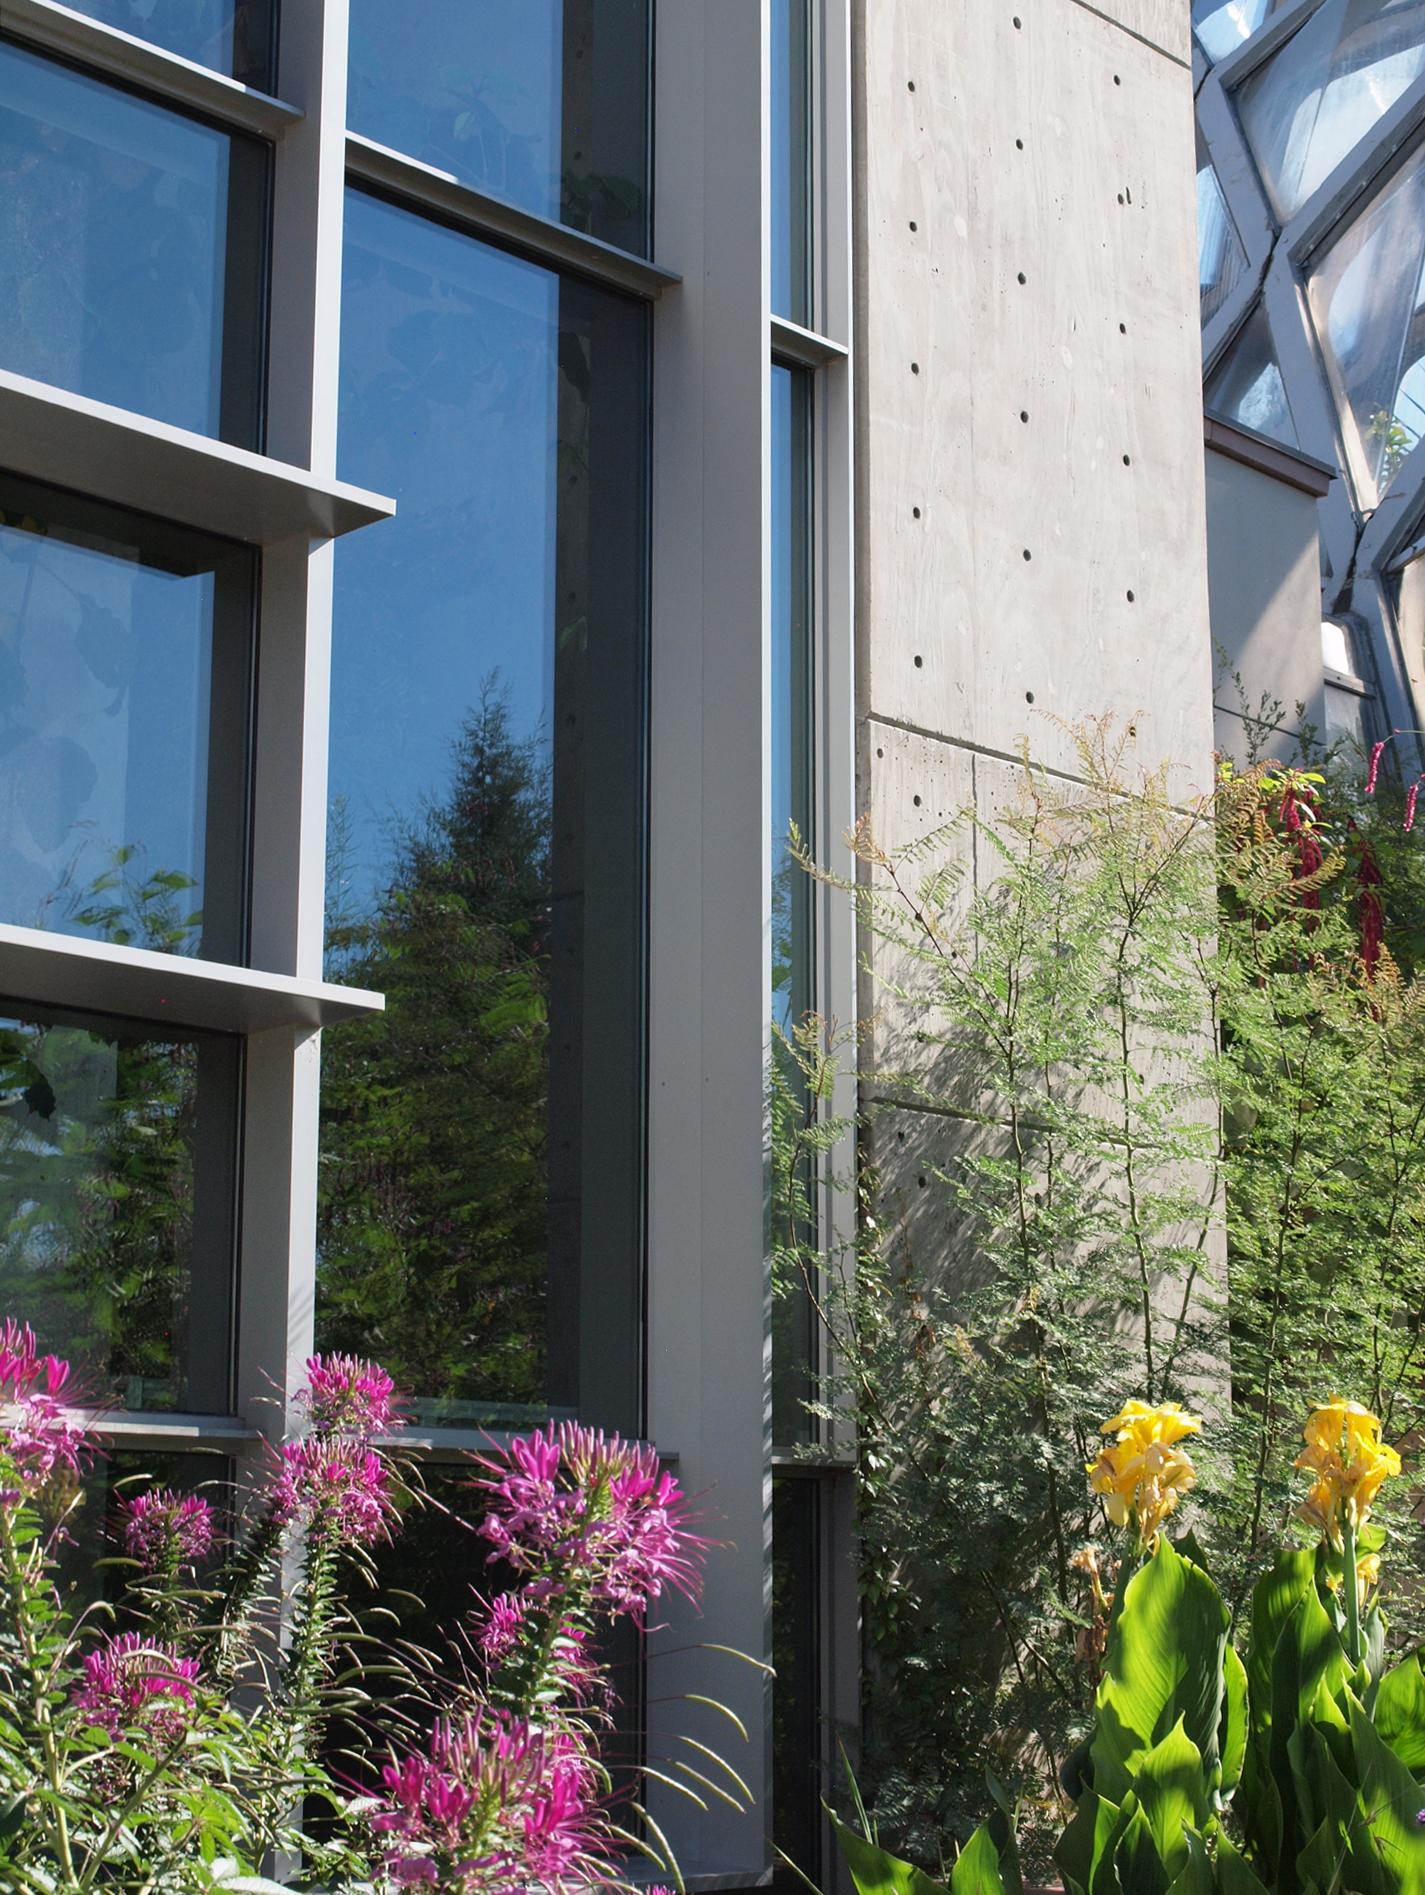 Denver Botanic Gardens, Tryba Architects  (prior to establishing Janco Designs)  Photo: Janco Designs